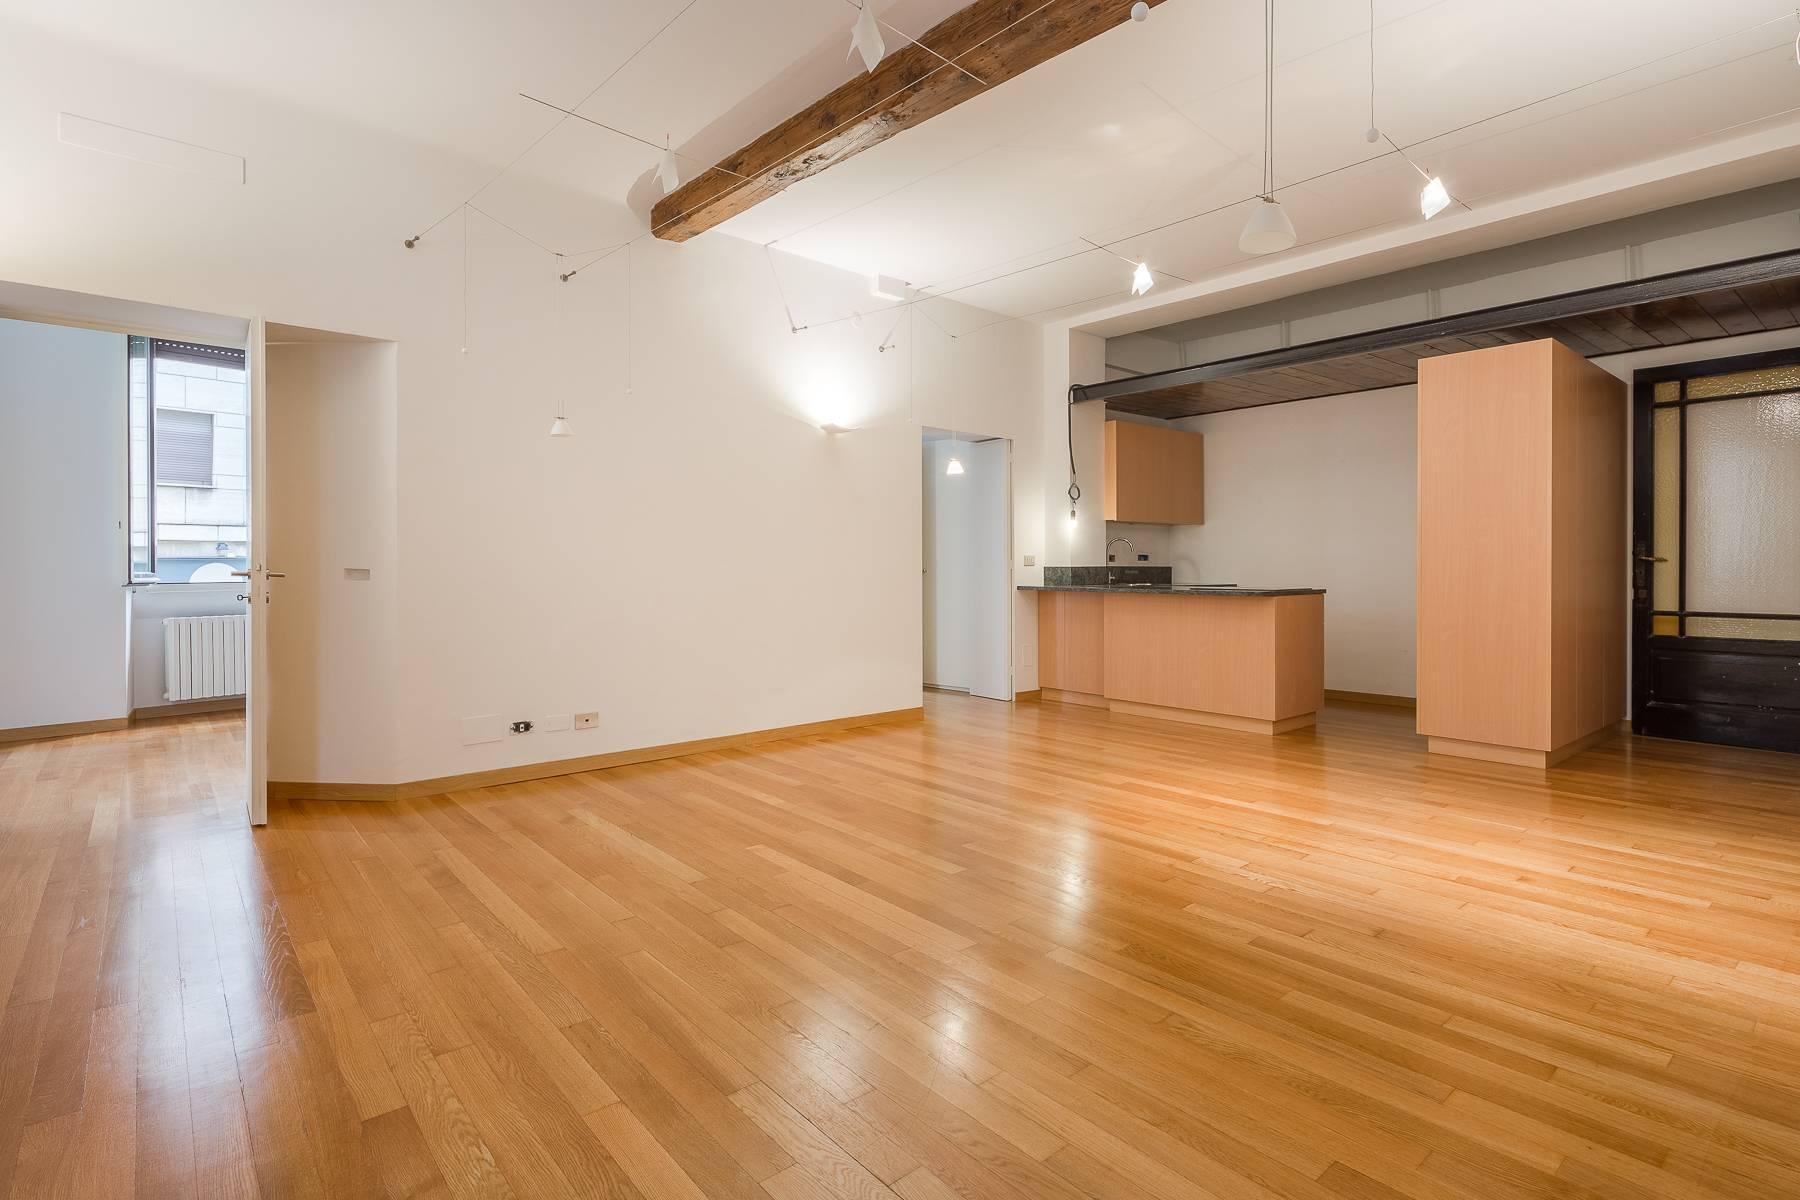 Apartment in an elegant period building located in a prestigious city district - 17